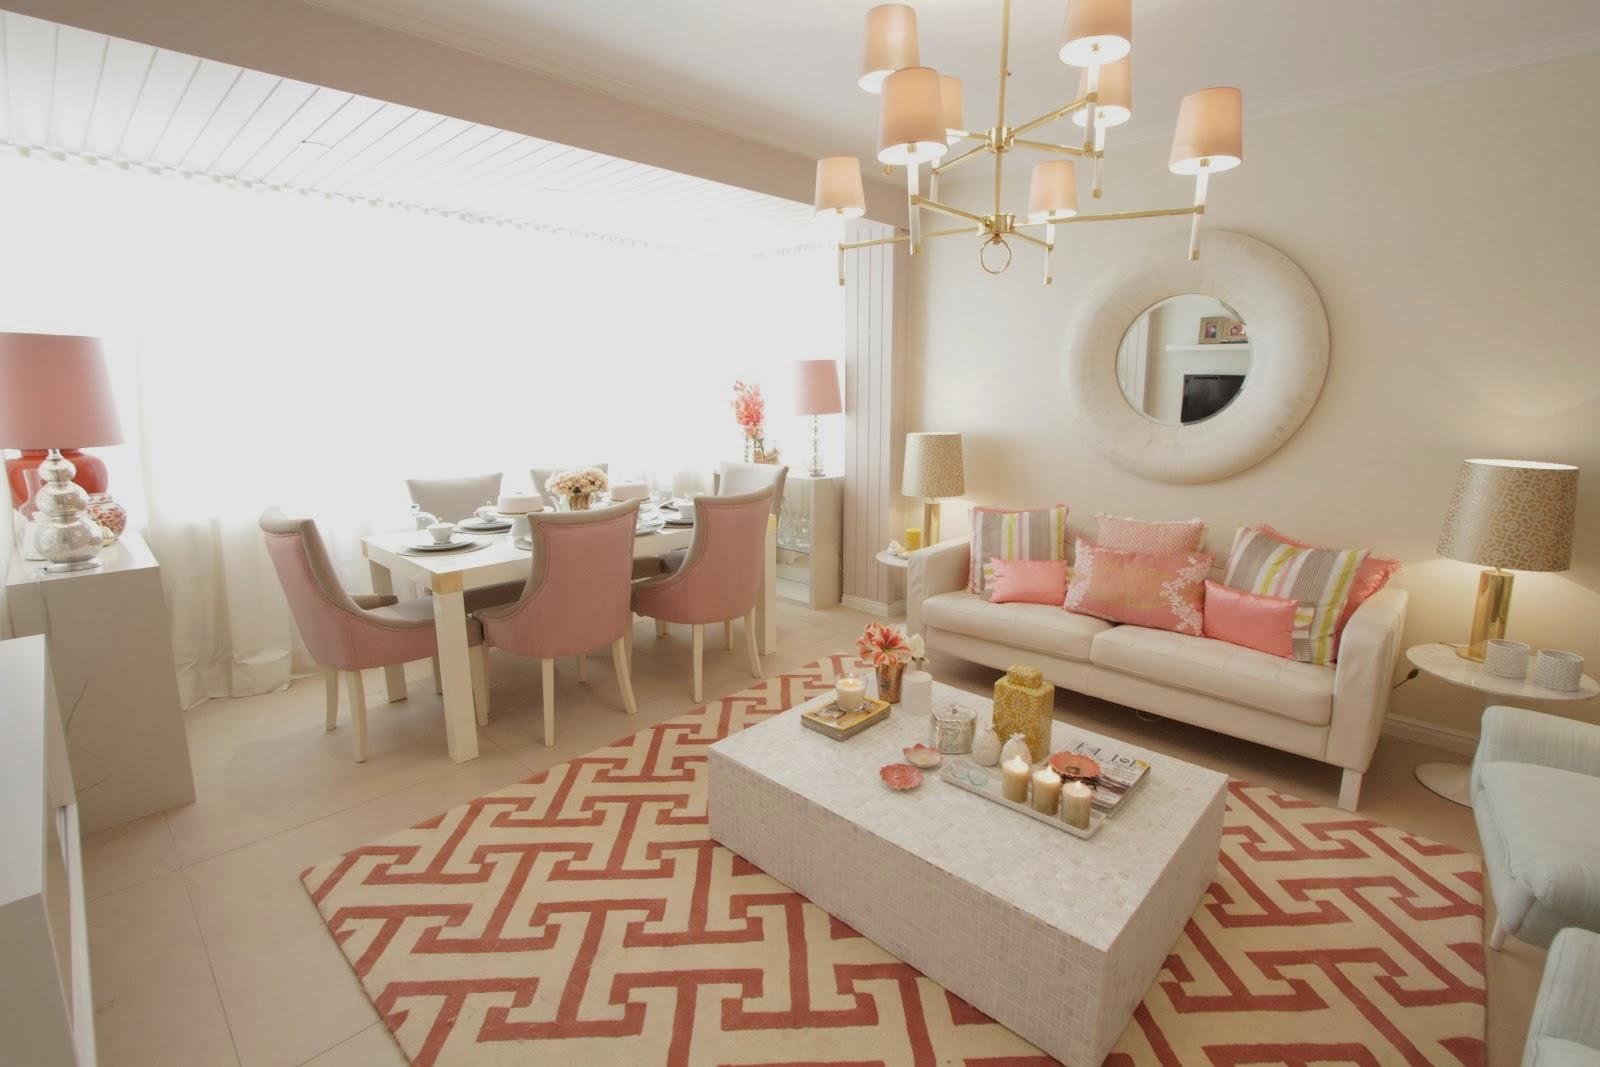 Abajur Para Sala De Jantar Abajur Luxo Cristal Grande Cm Quarto  -> Abajur Pra Sala De Estar